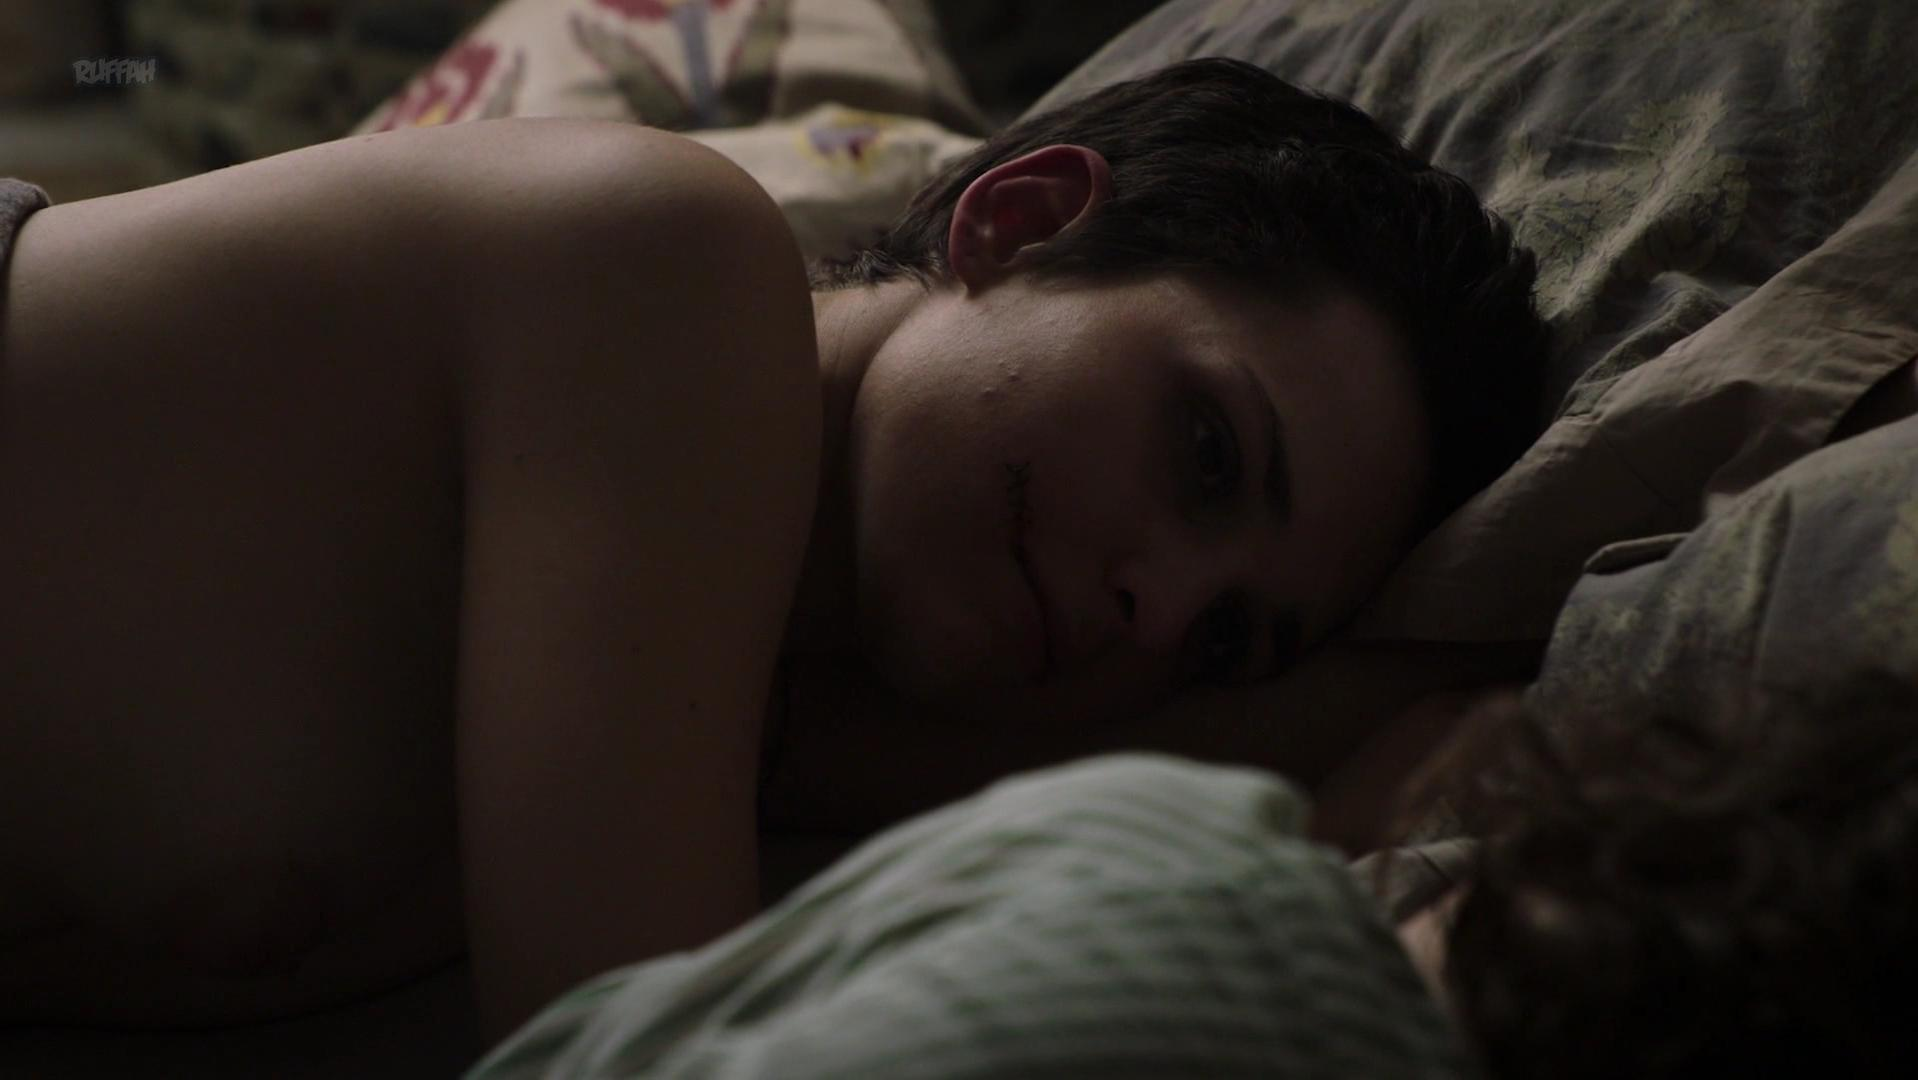 Sara Serraiocco nude - Counterpart s01e08 (2018)